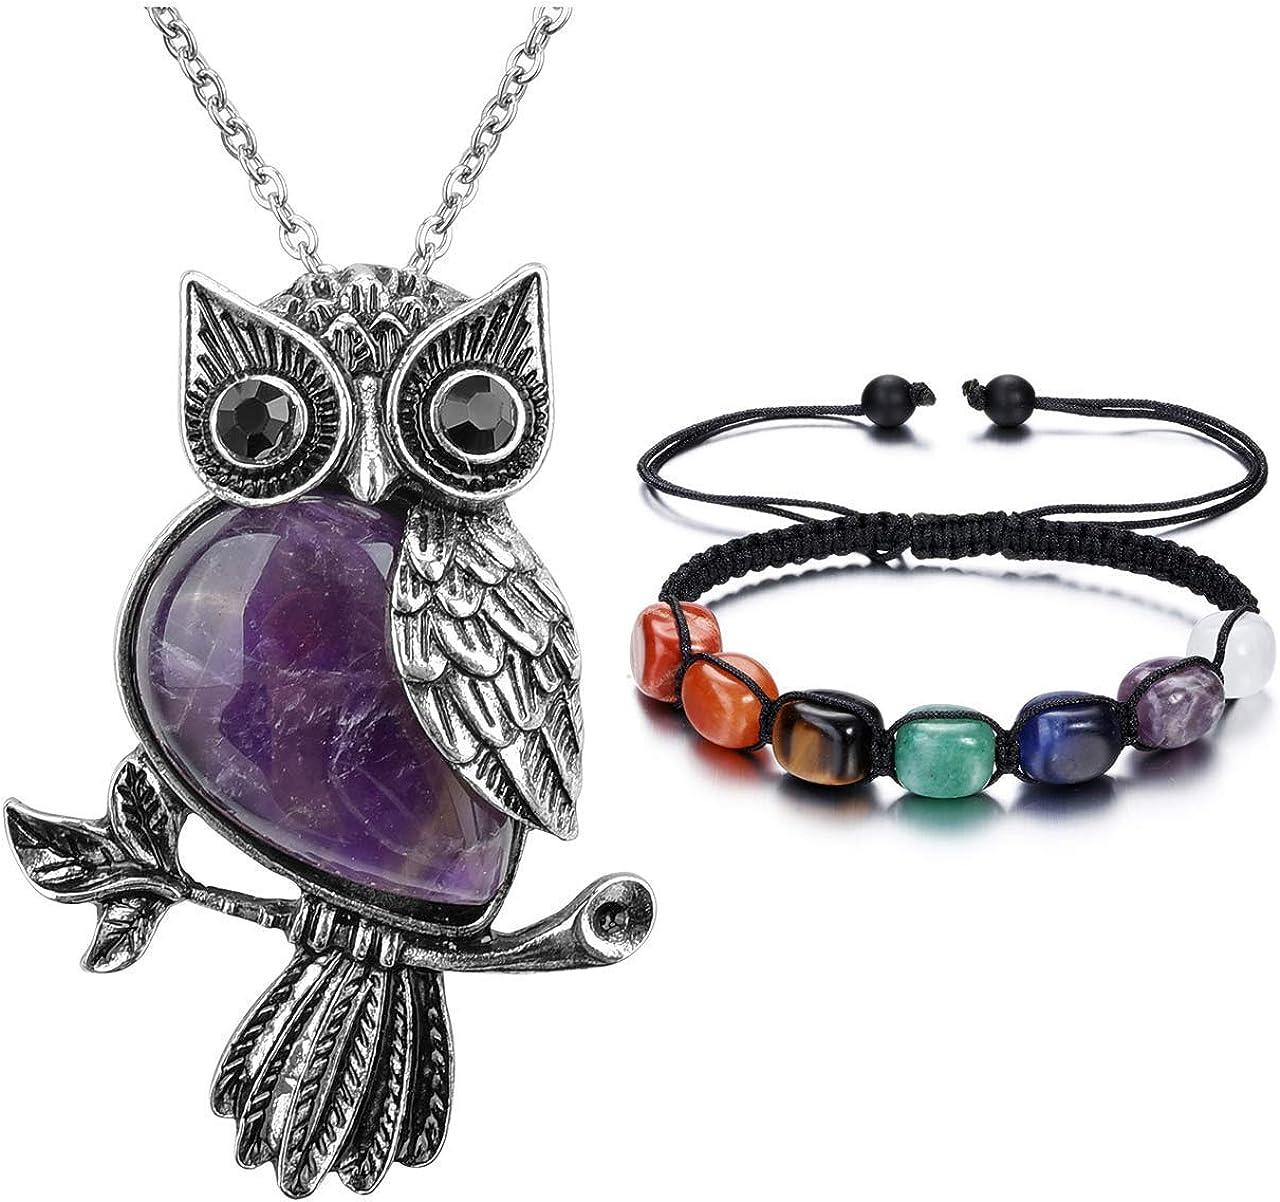 Aventurine quartz green bracelet with owl Pendant